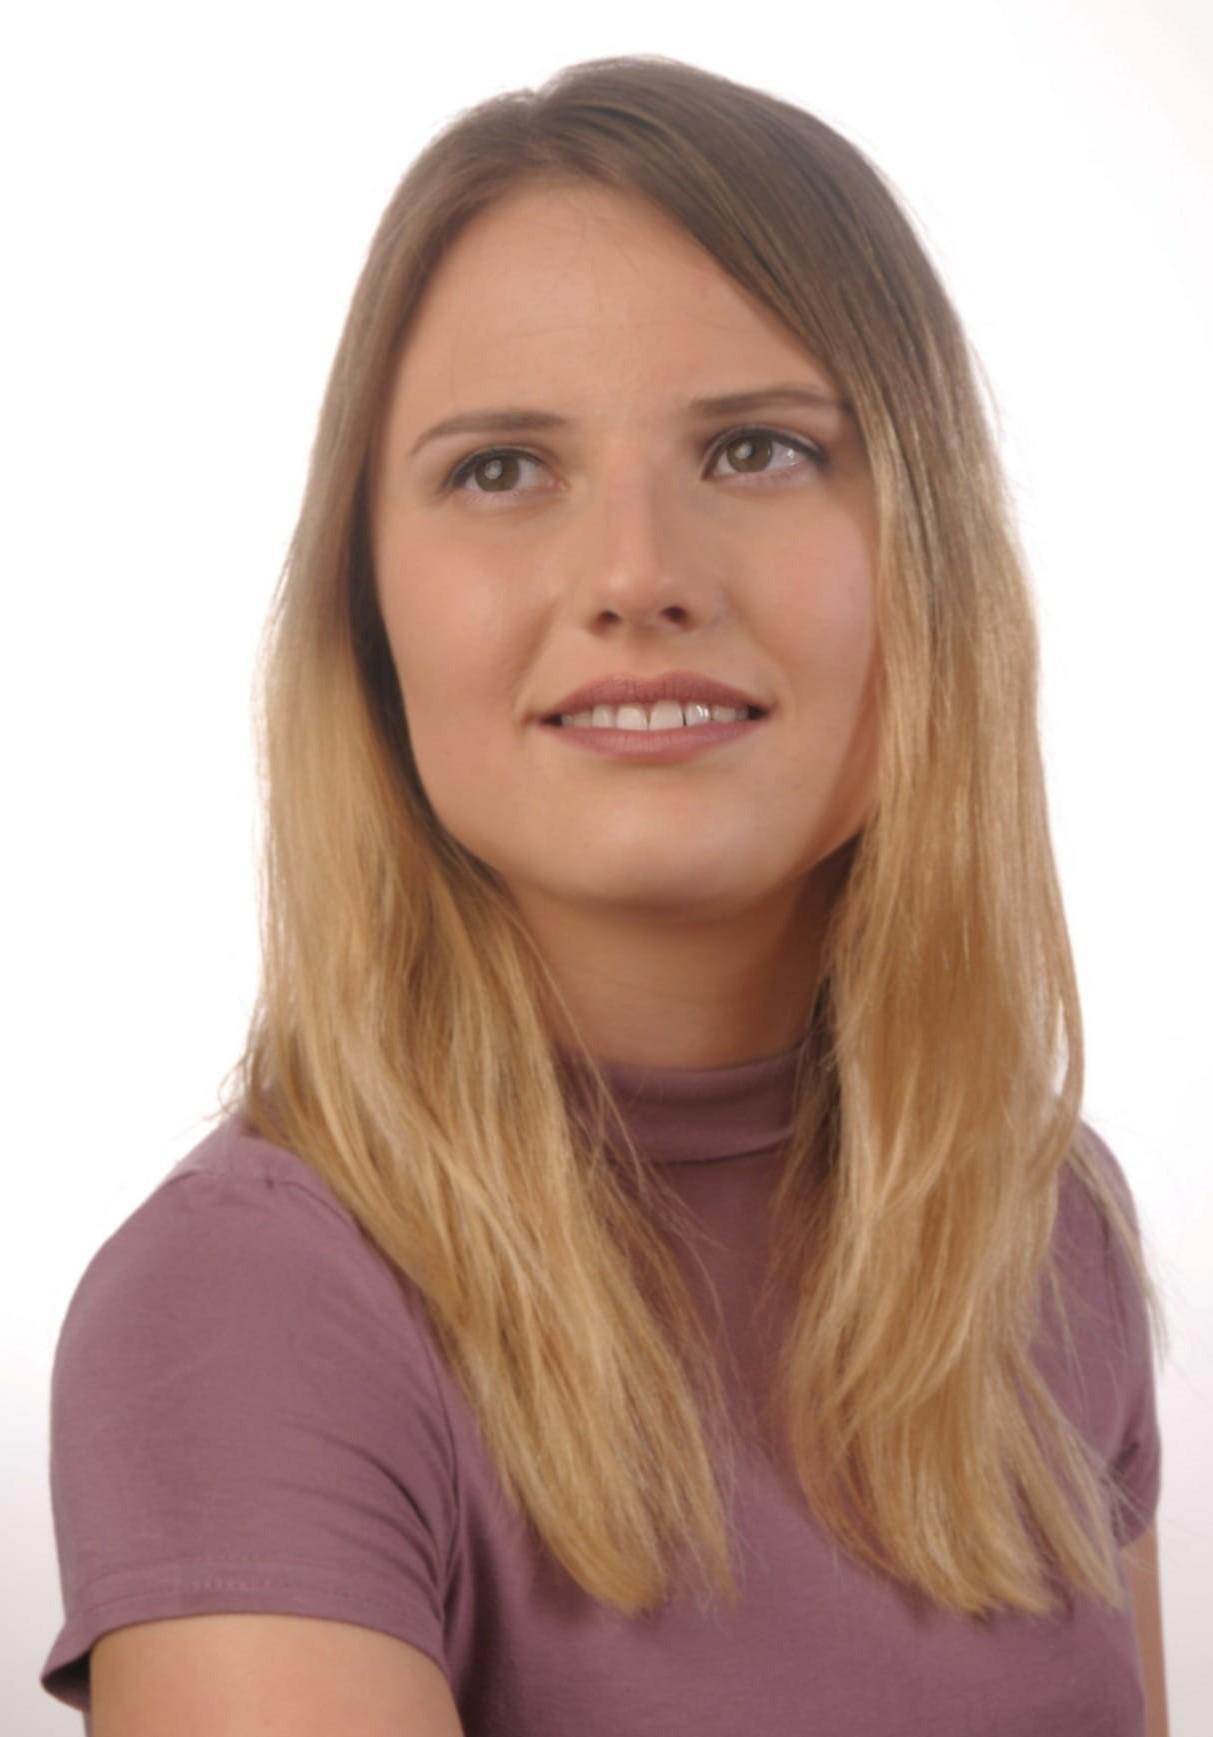 Bianca Pilz